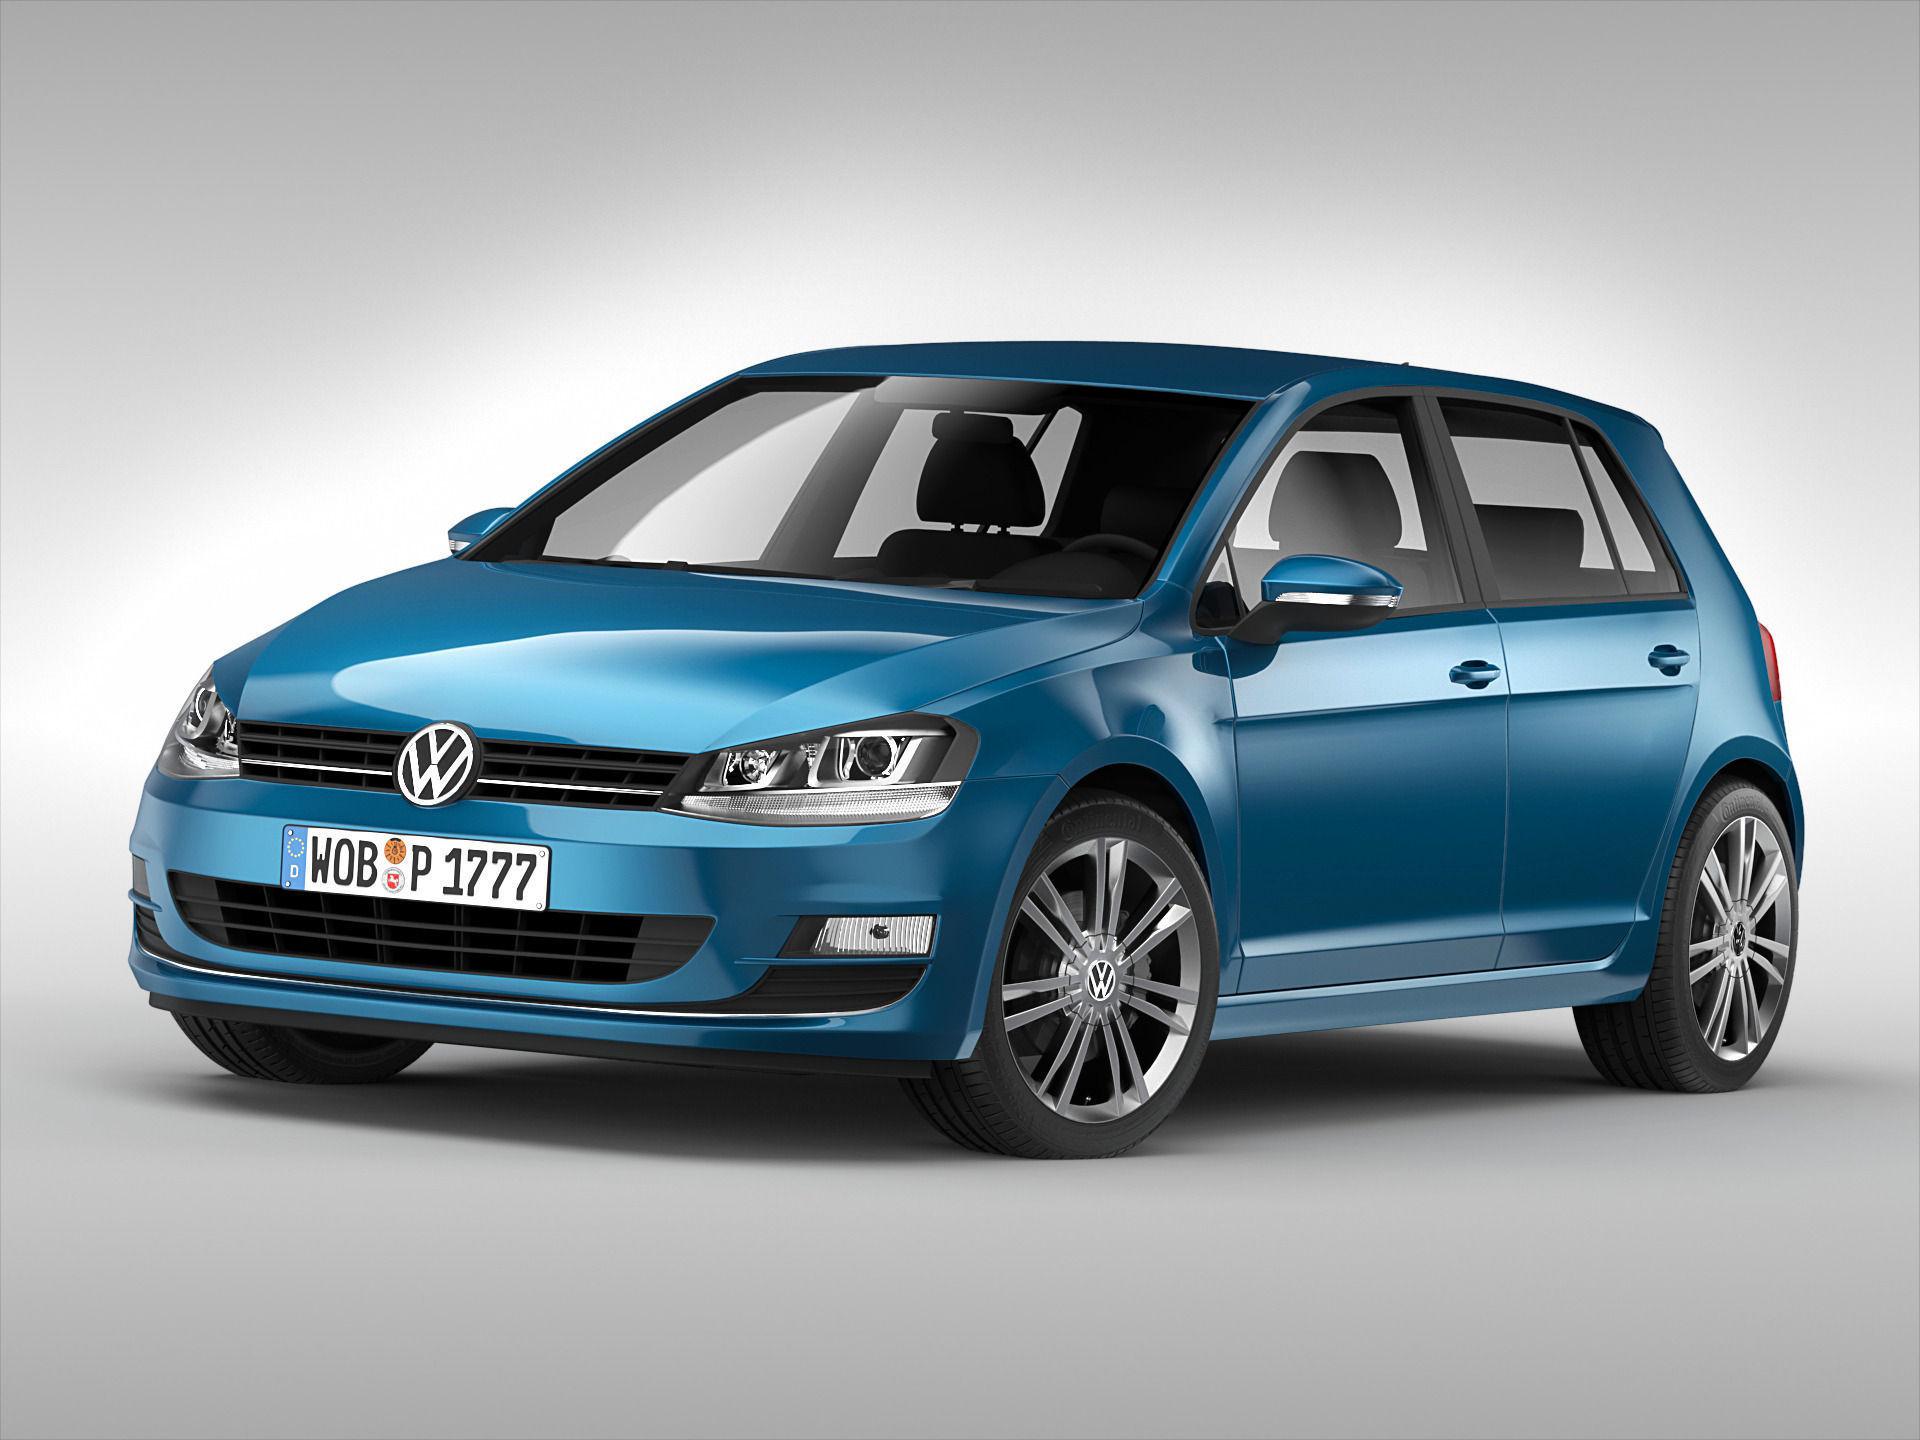 Volkswagen Golf MK7 2013